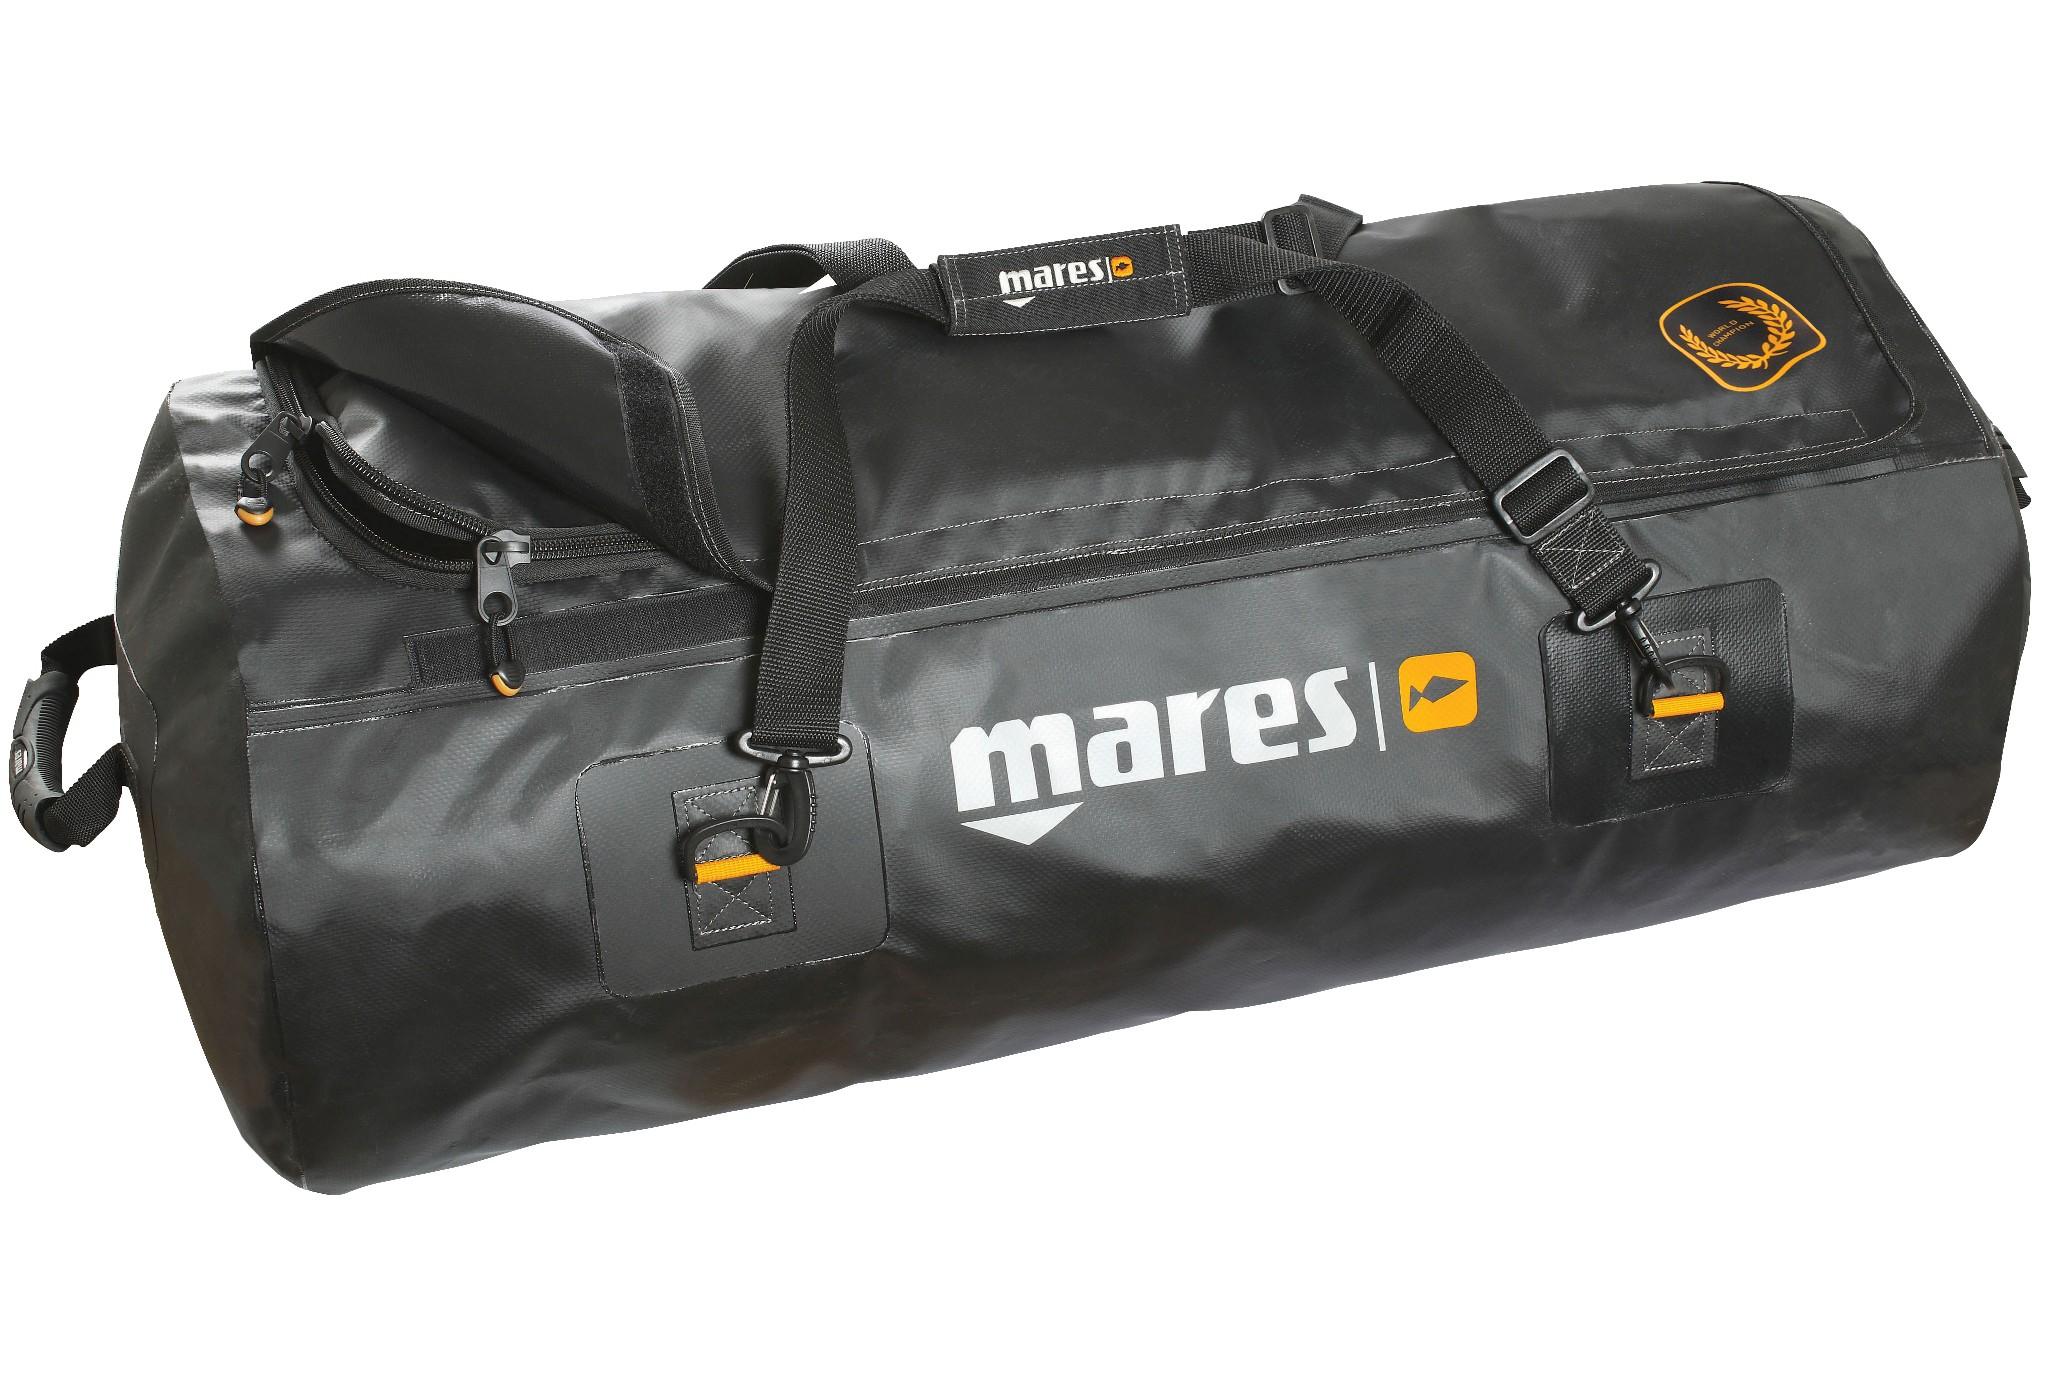 Mares Attack Titan Duffle Bag